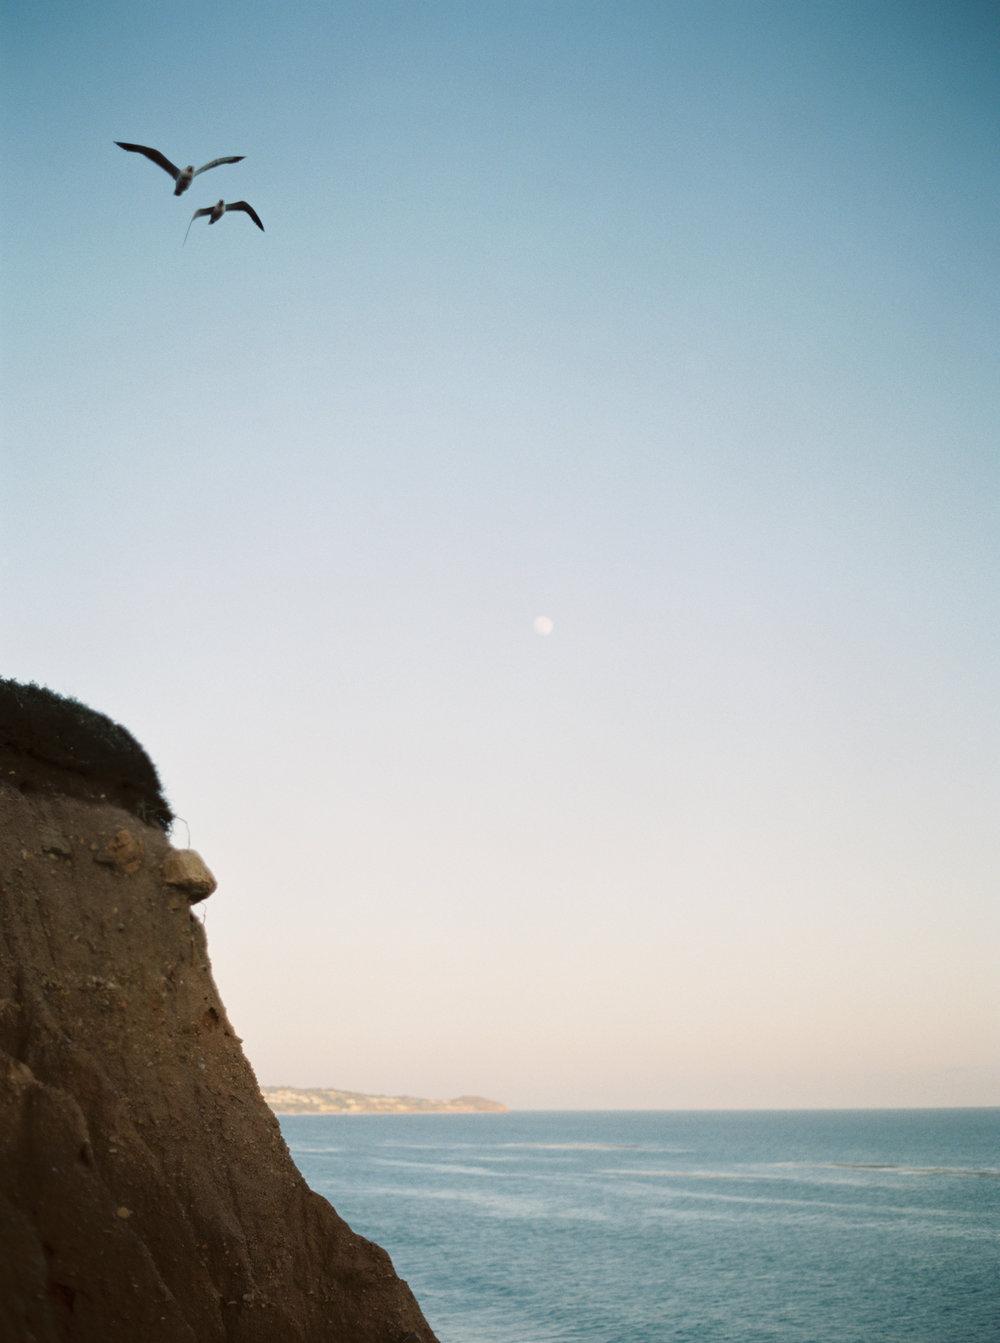 Los+Angeles+Malibu+California+Destination+Wedding+Planner+Designer+Brilliant+Wedding+Co..jpeg